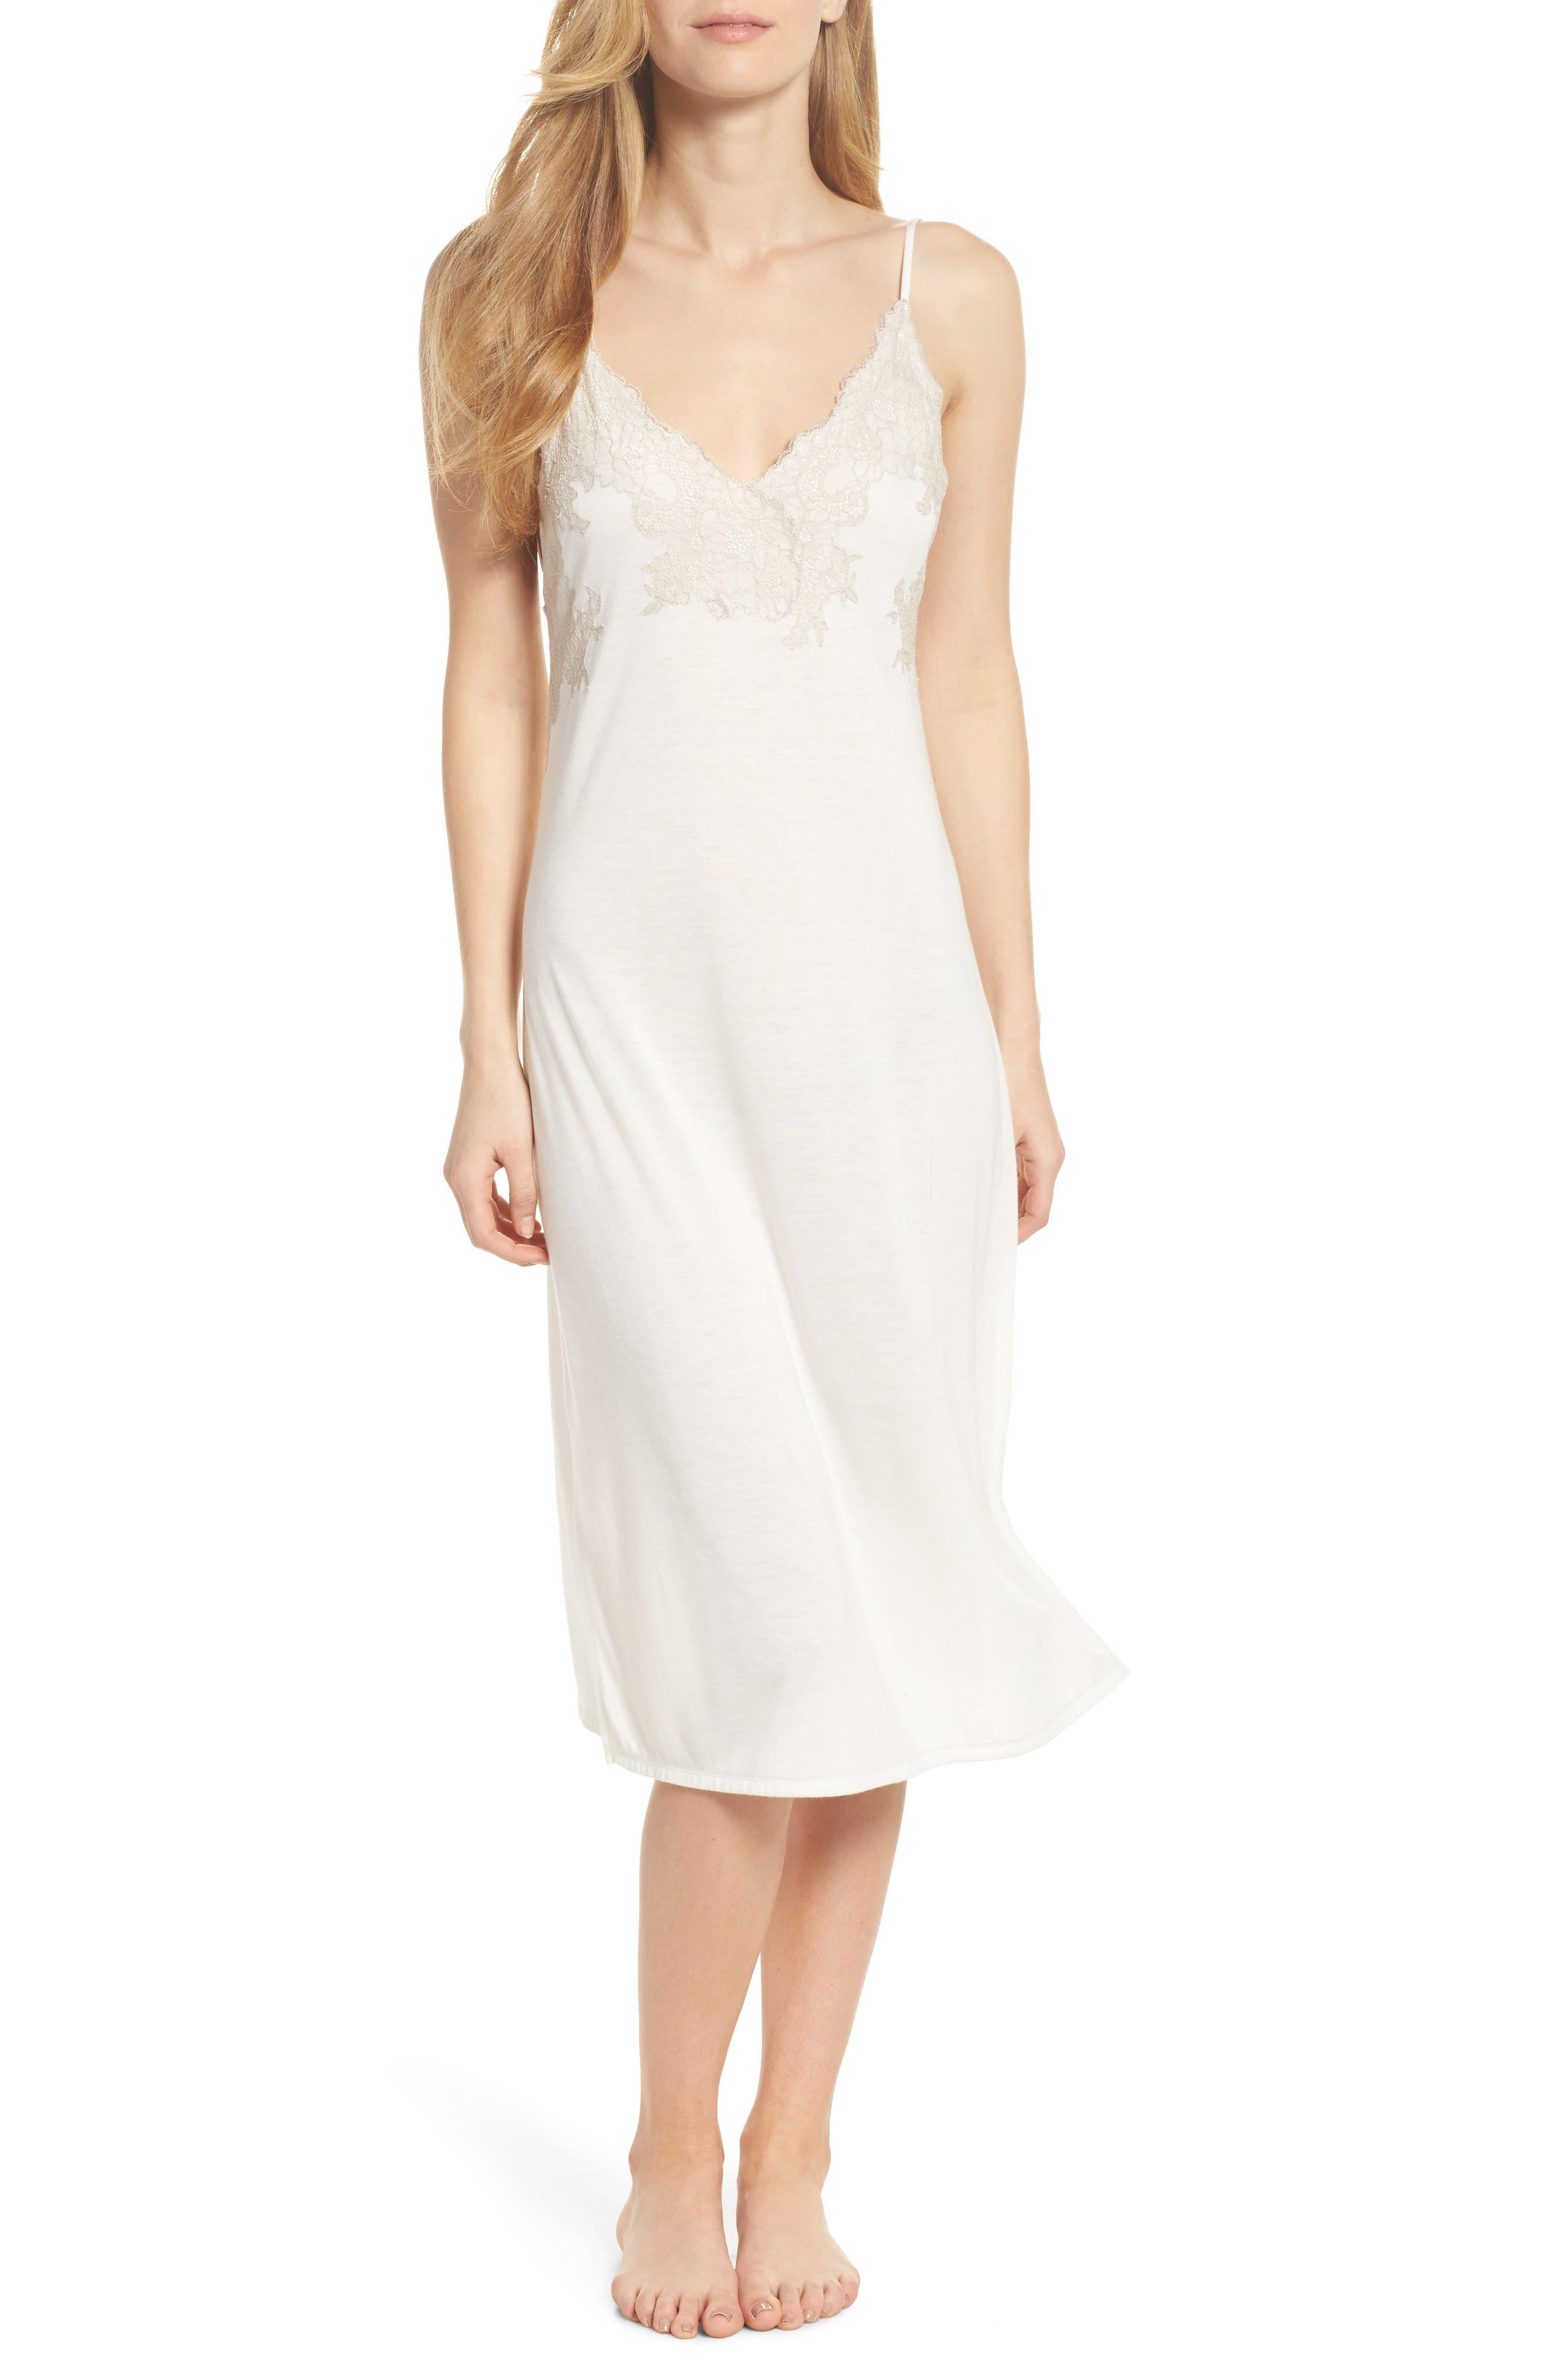 Natori Luxe Shangri-La Nightgown, Ivory